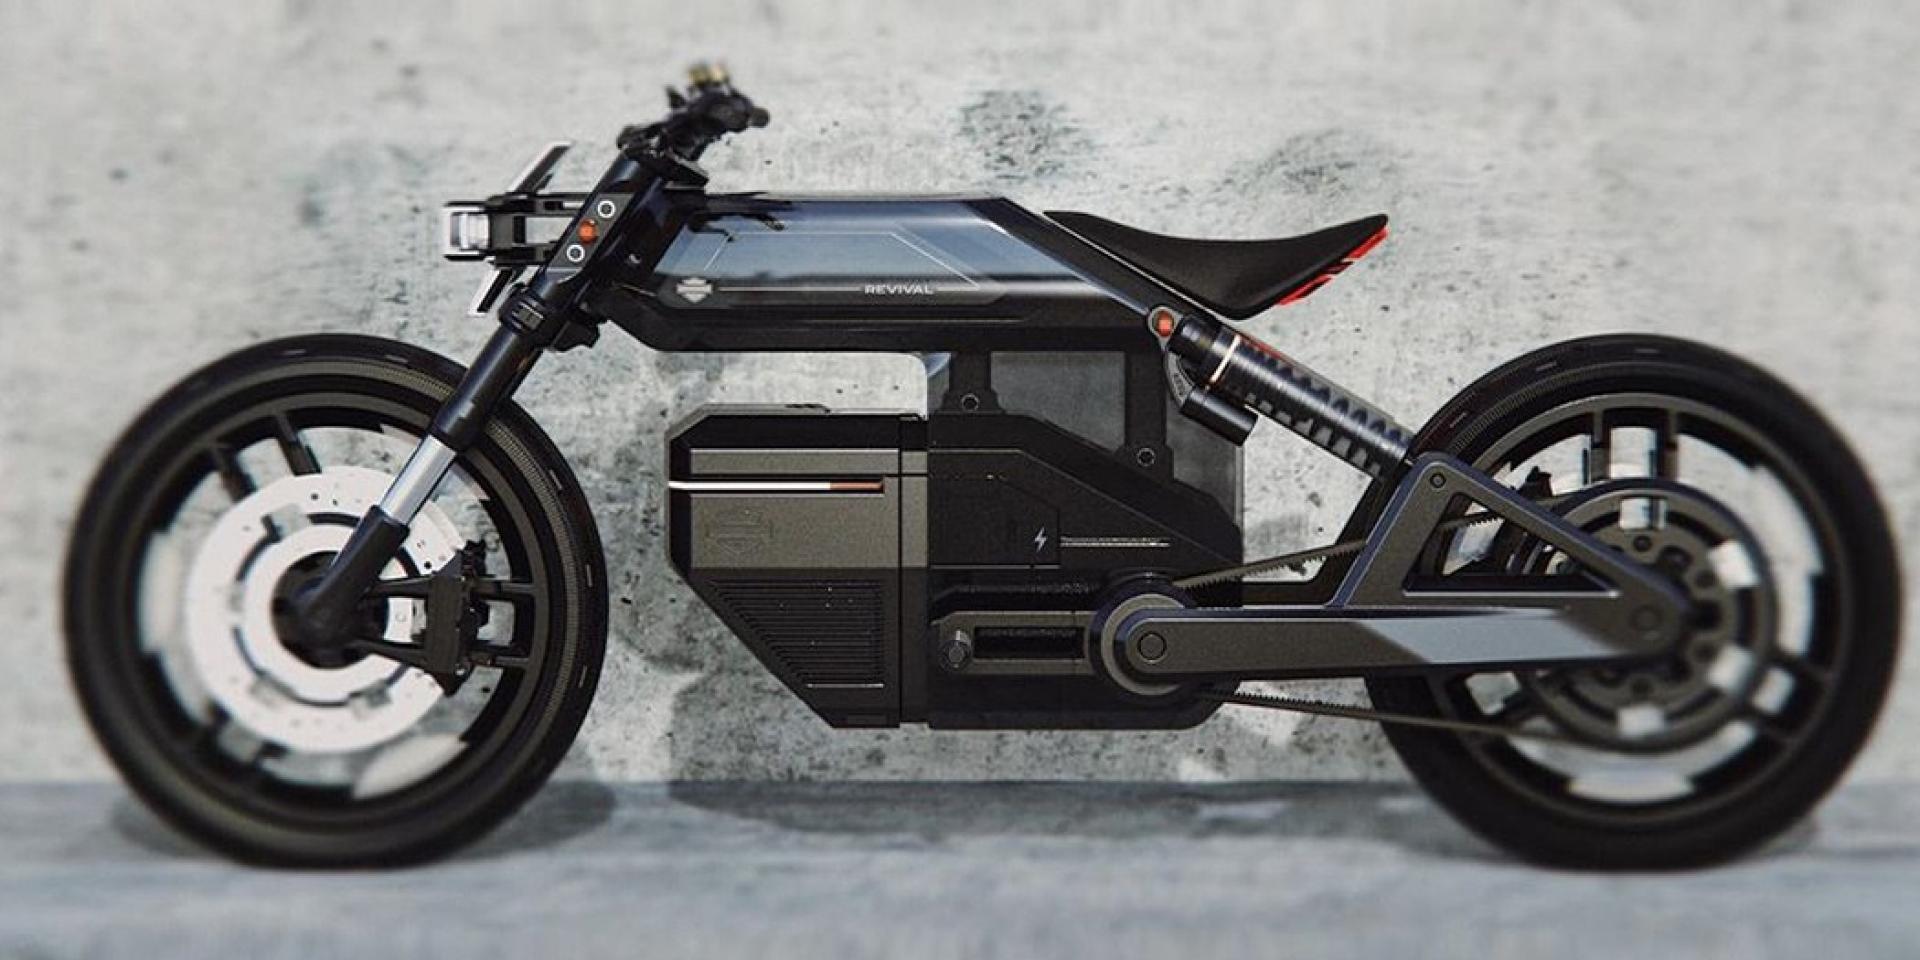 想像中的哈雷入門電動車款!極簡Harley-Davidson Revival出現!